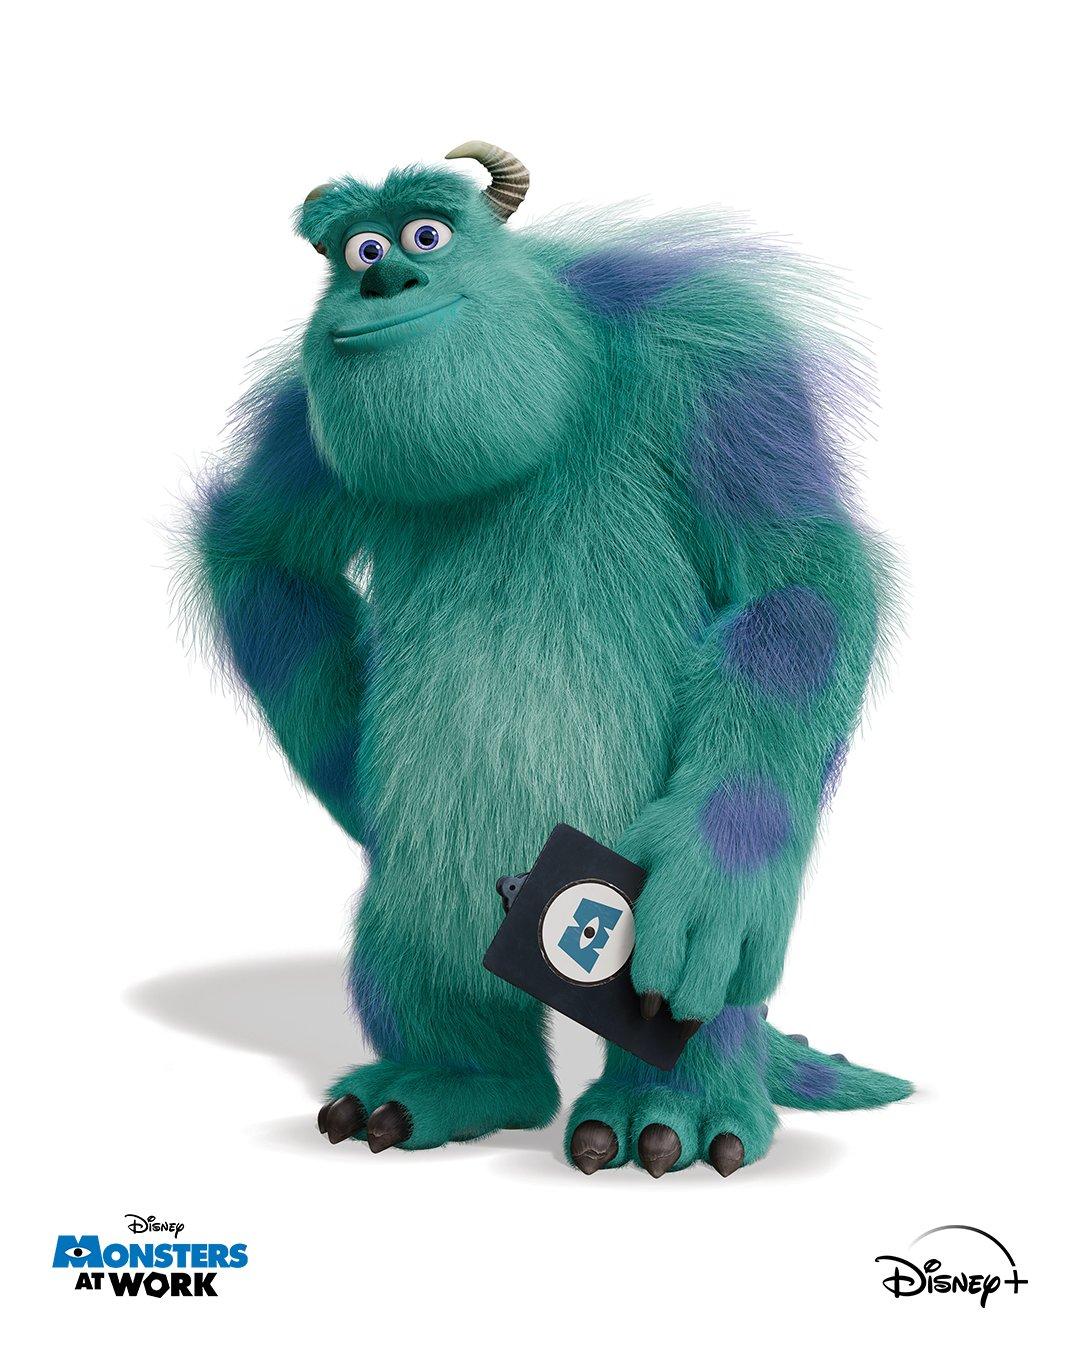 Monstres & Cie : Au Travail [Disney Television - 2020] EwsXRxQVEAUGOeS?format=jpg&name=large